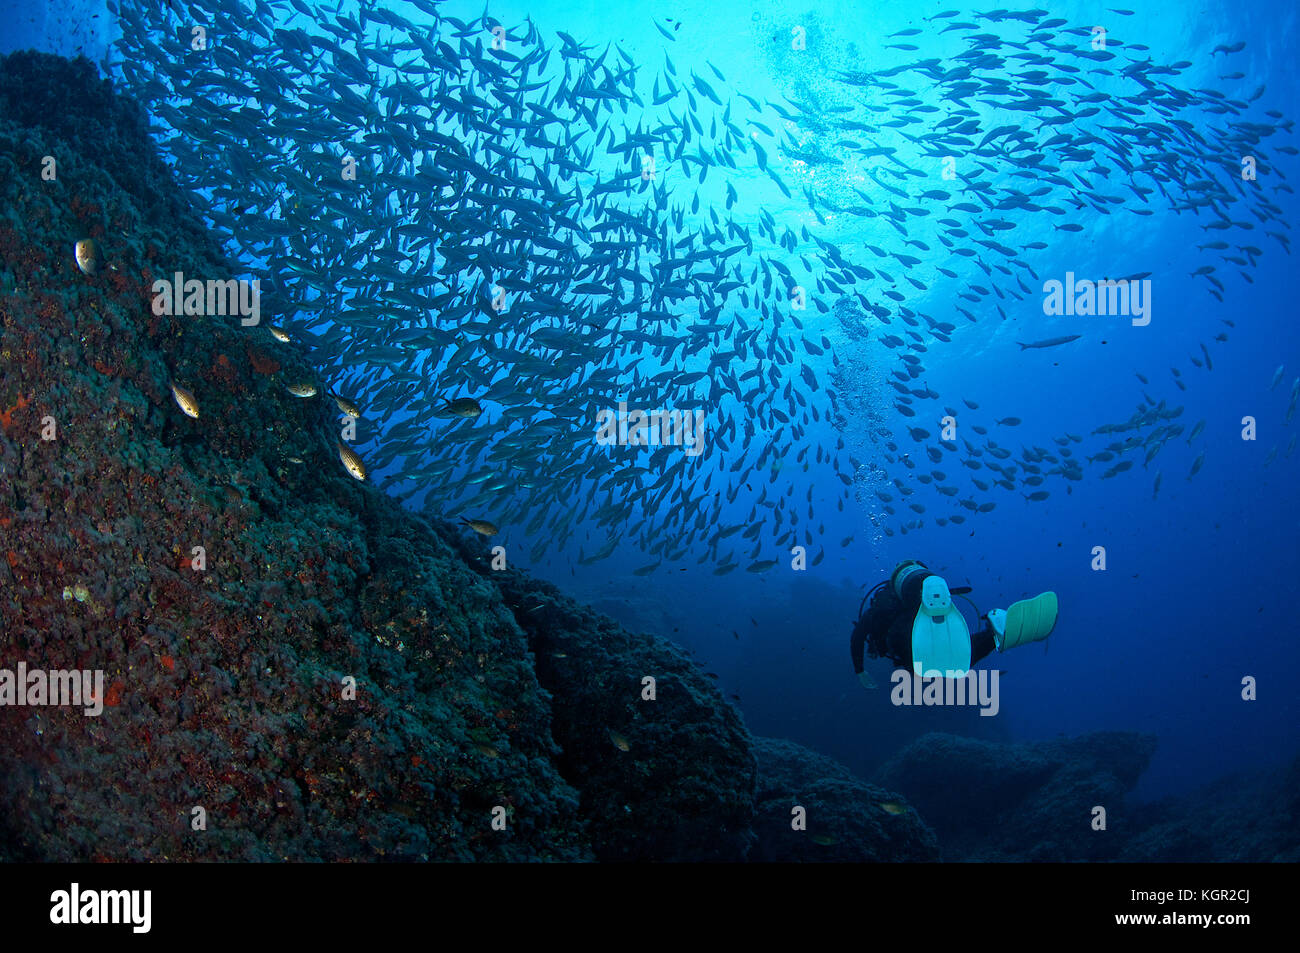 Scuba diver and fish school at Dado dive site in Ibiza (Balearic Islands, Spain) - Stock Image